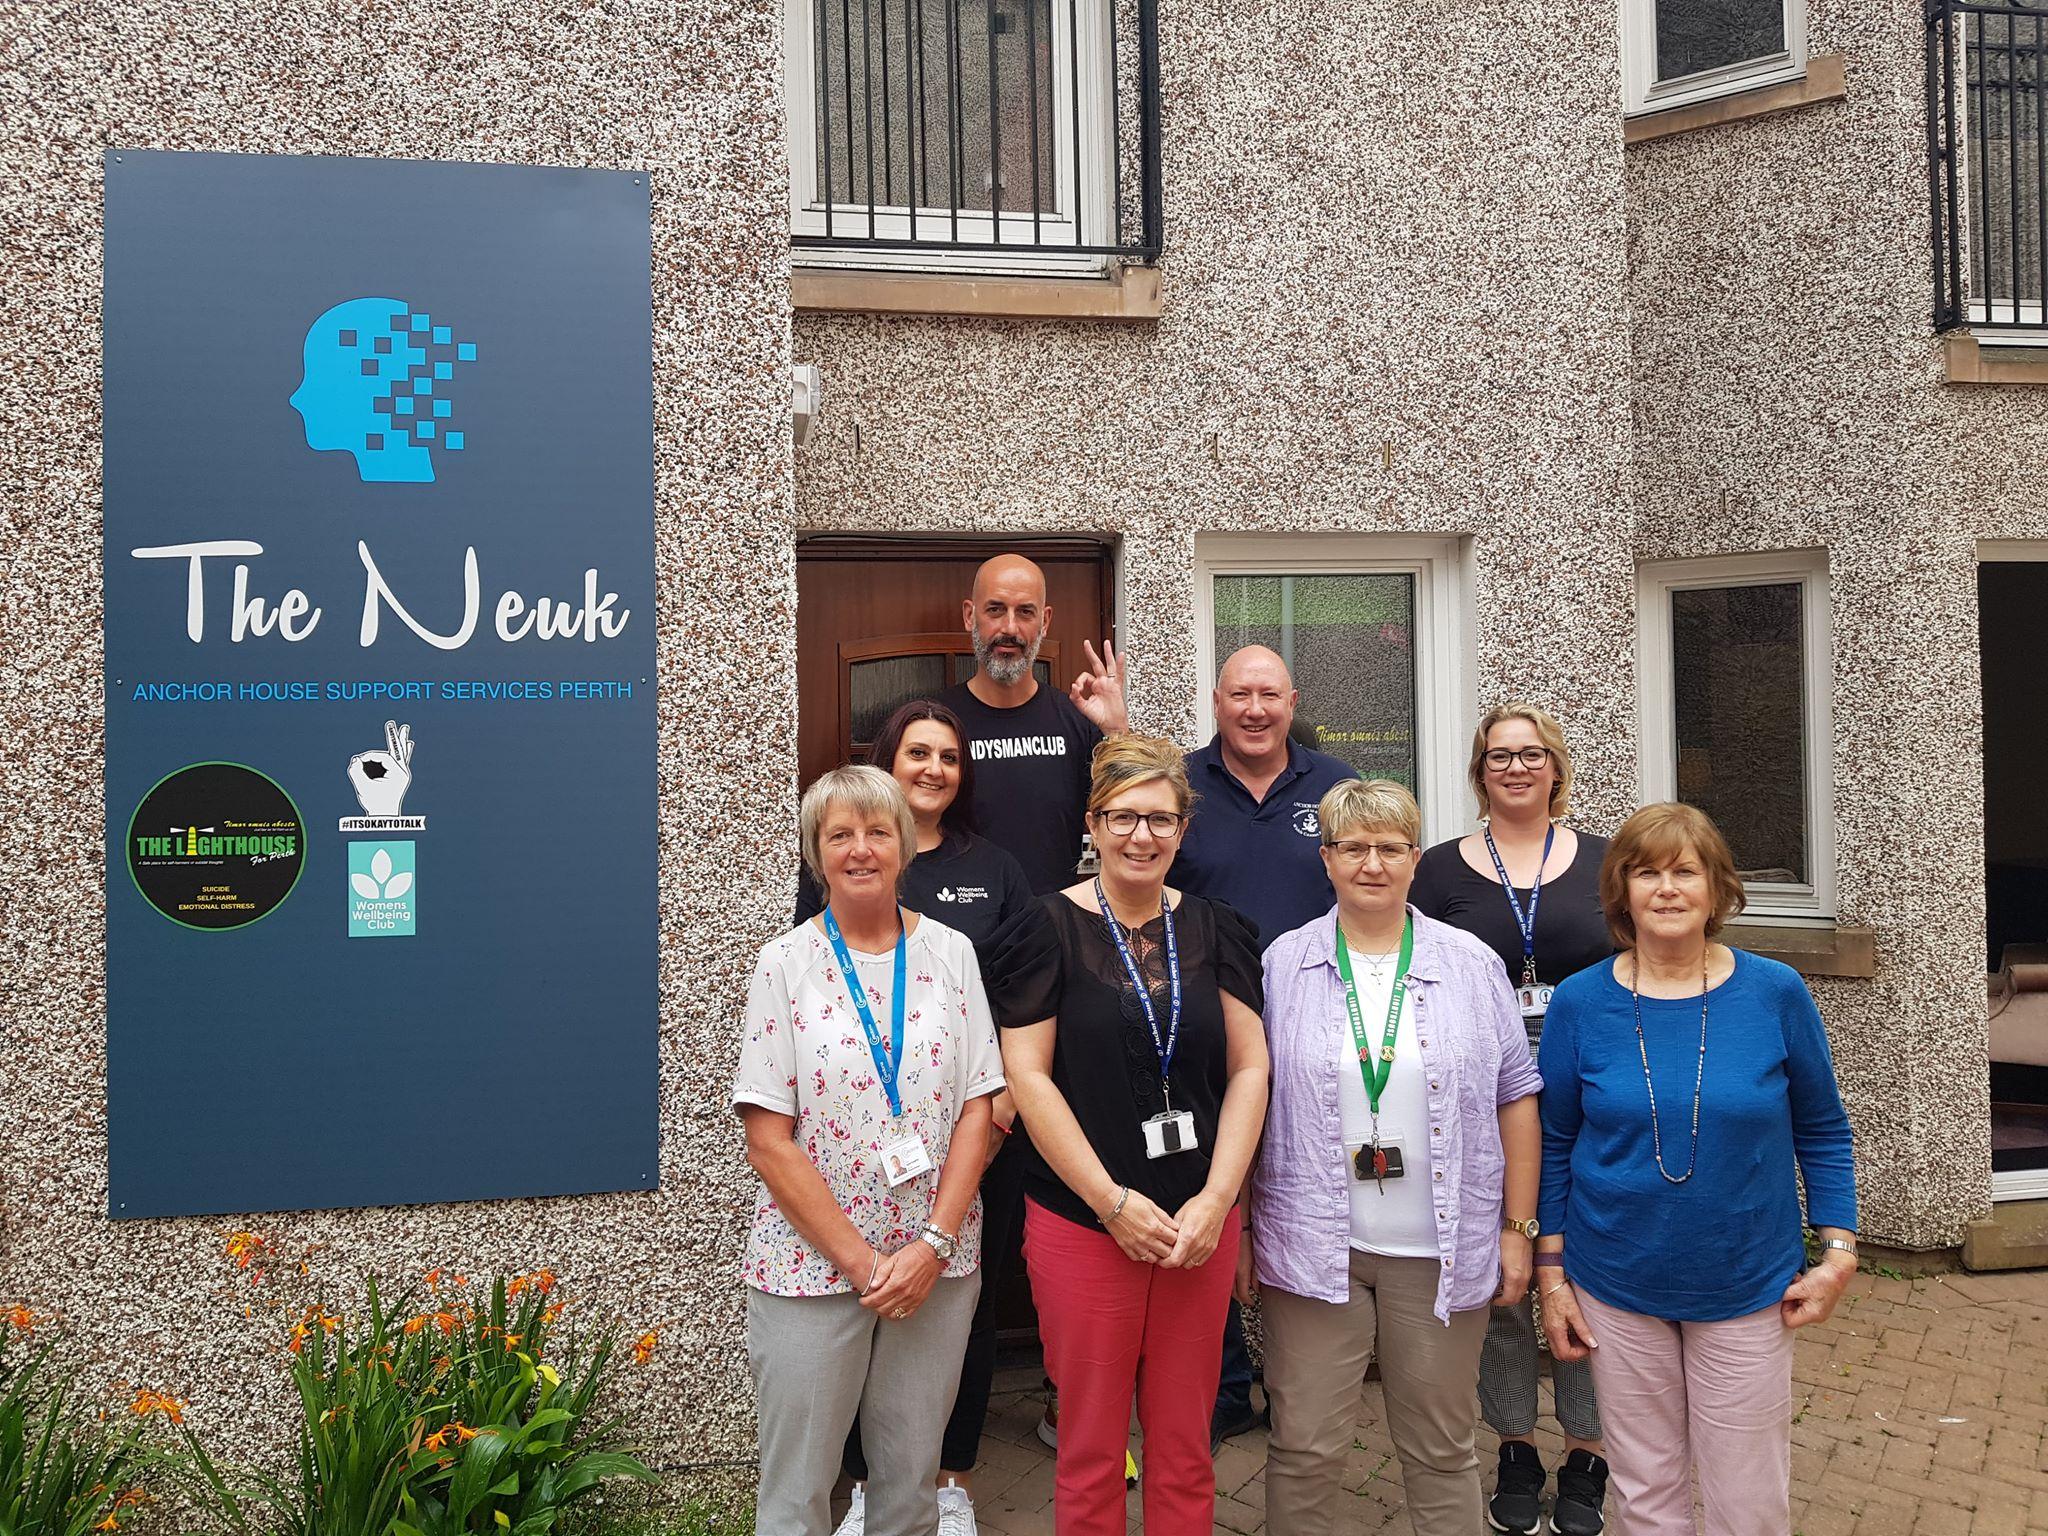 Representatives from organisations at The Neuk.